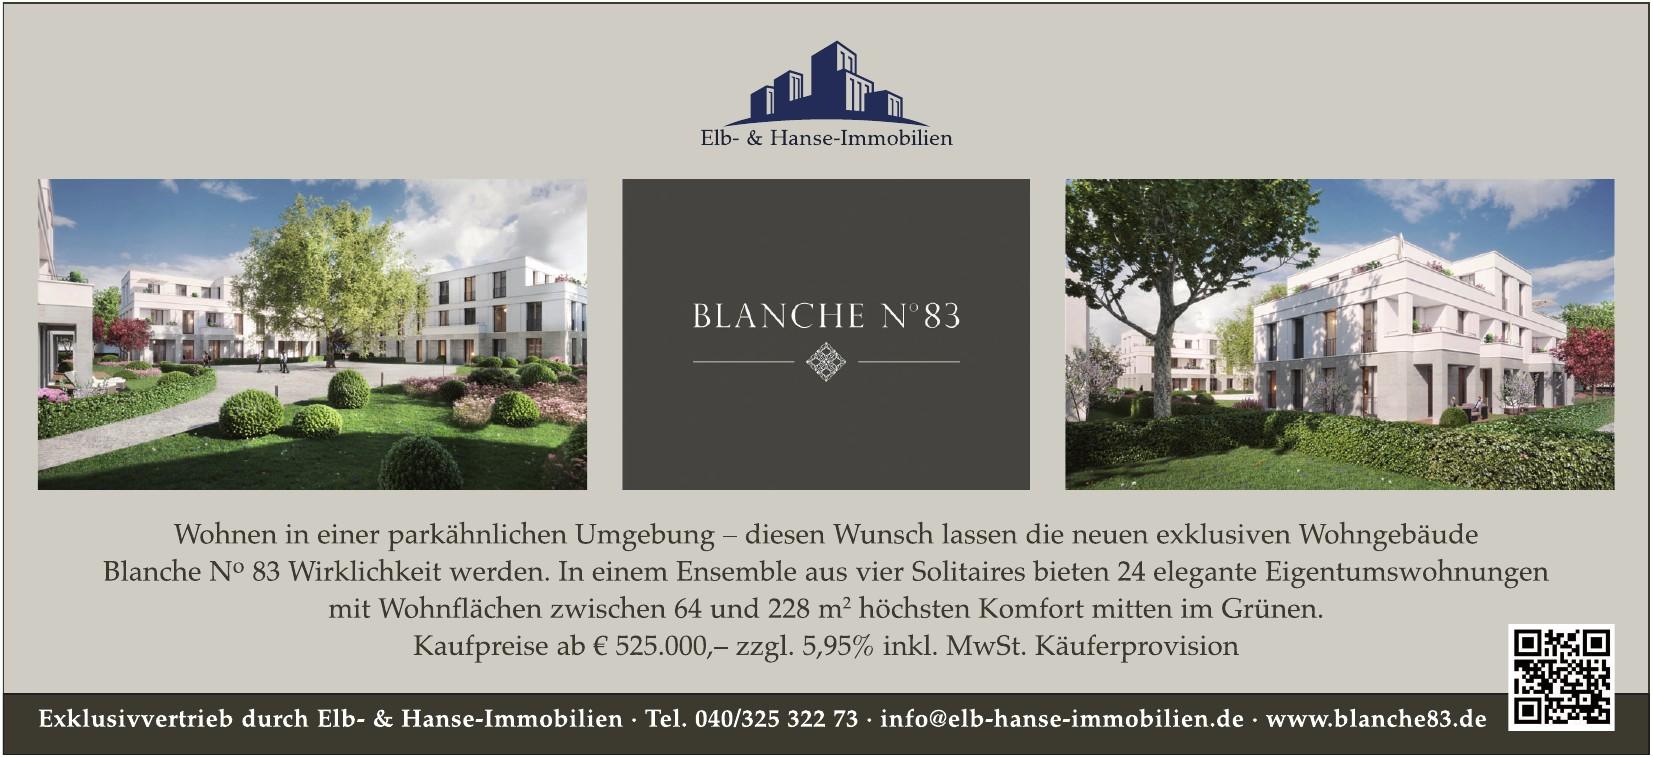 Elb- & Hanse-Immobilien